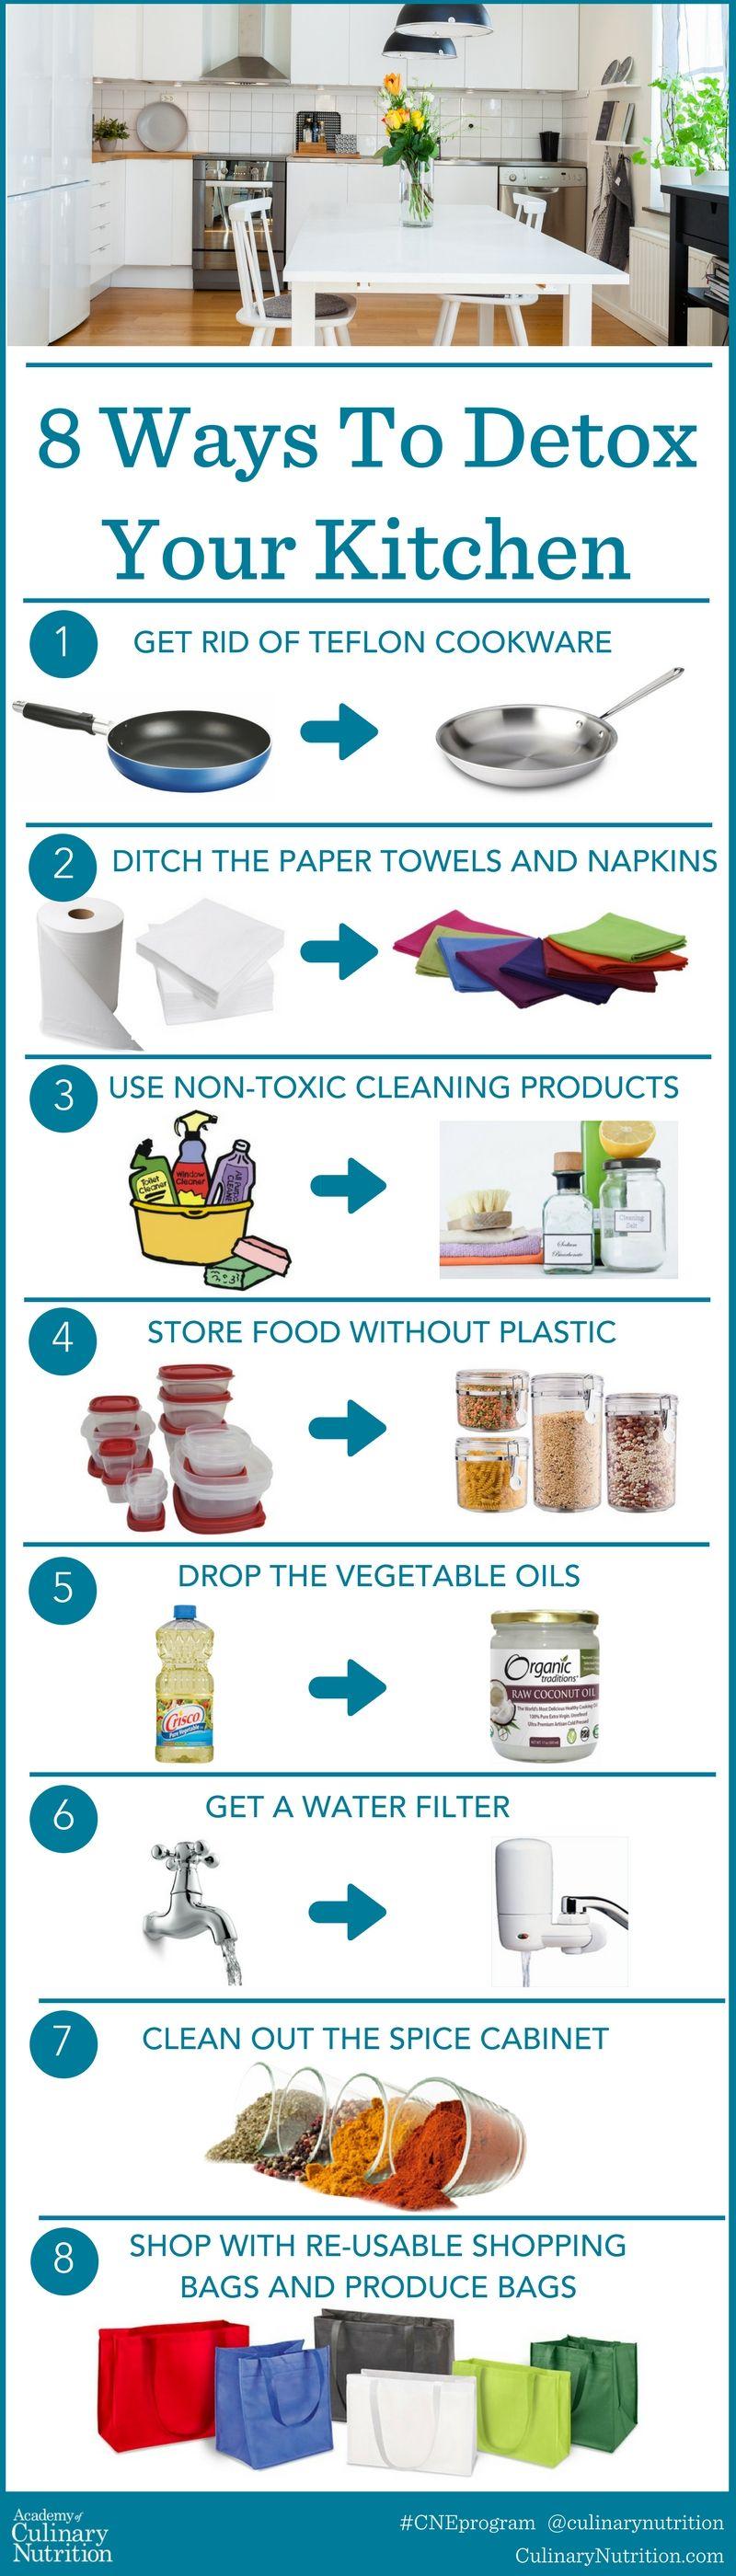 8 Ways to Detox Your Kitchen